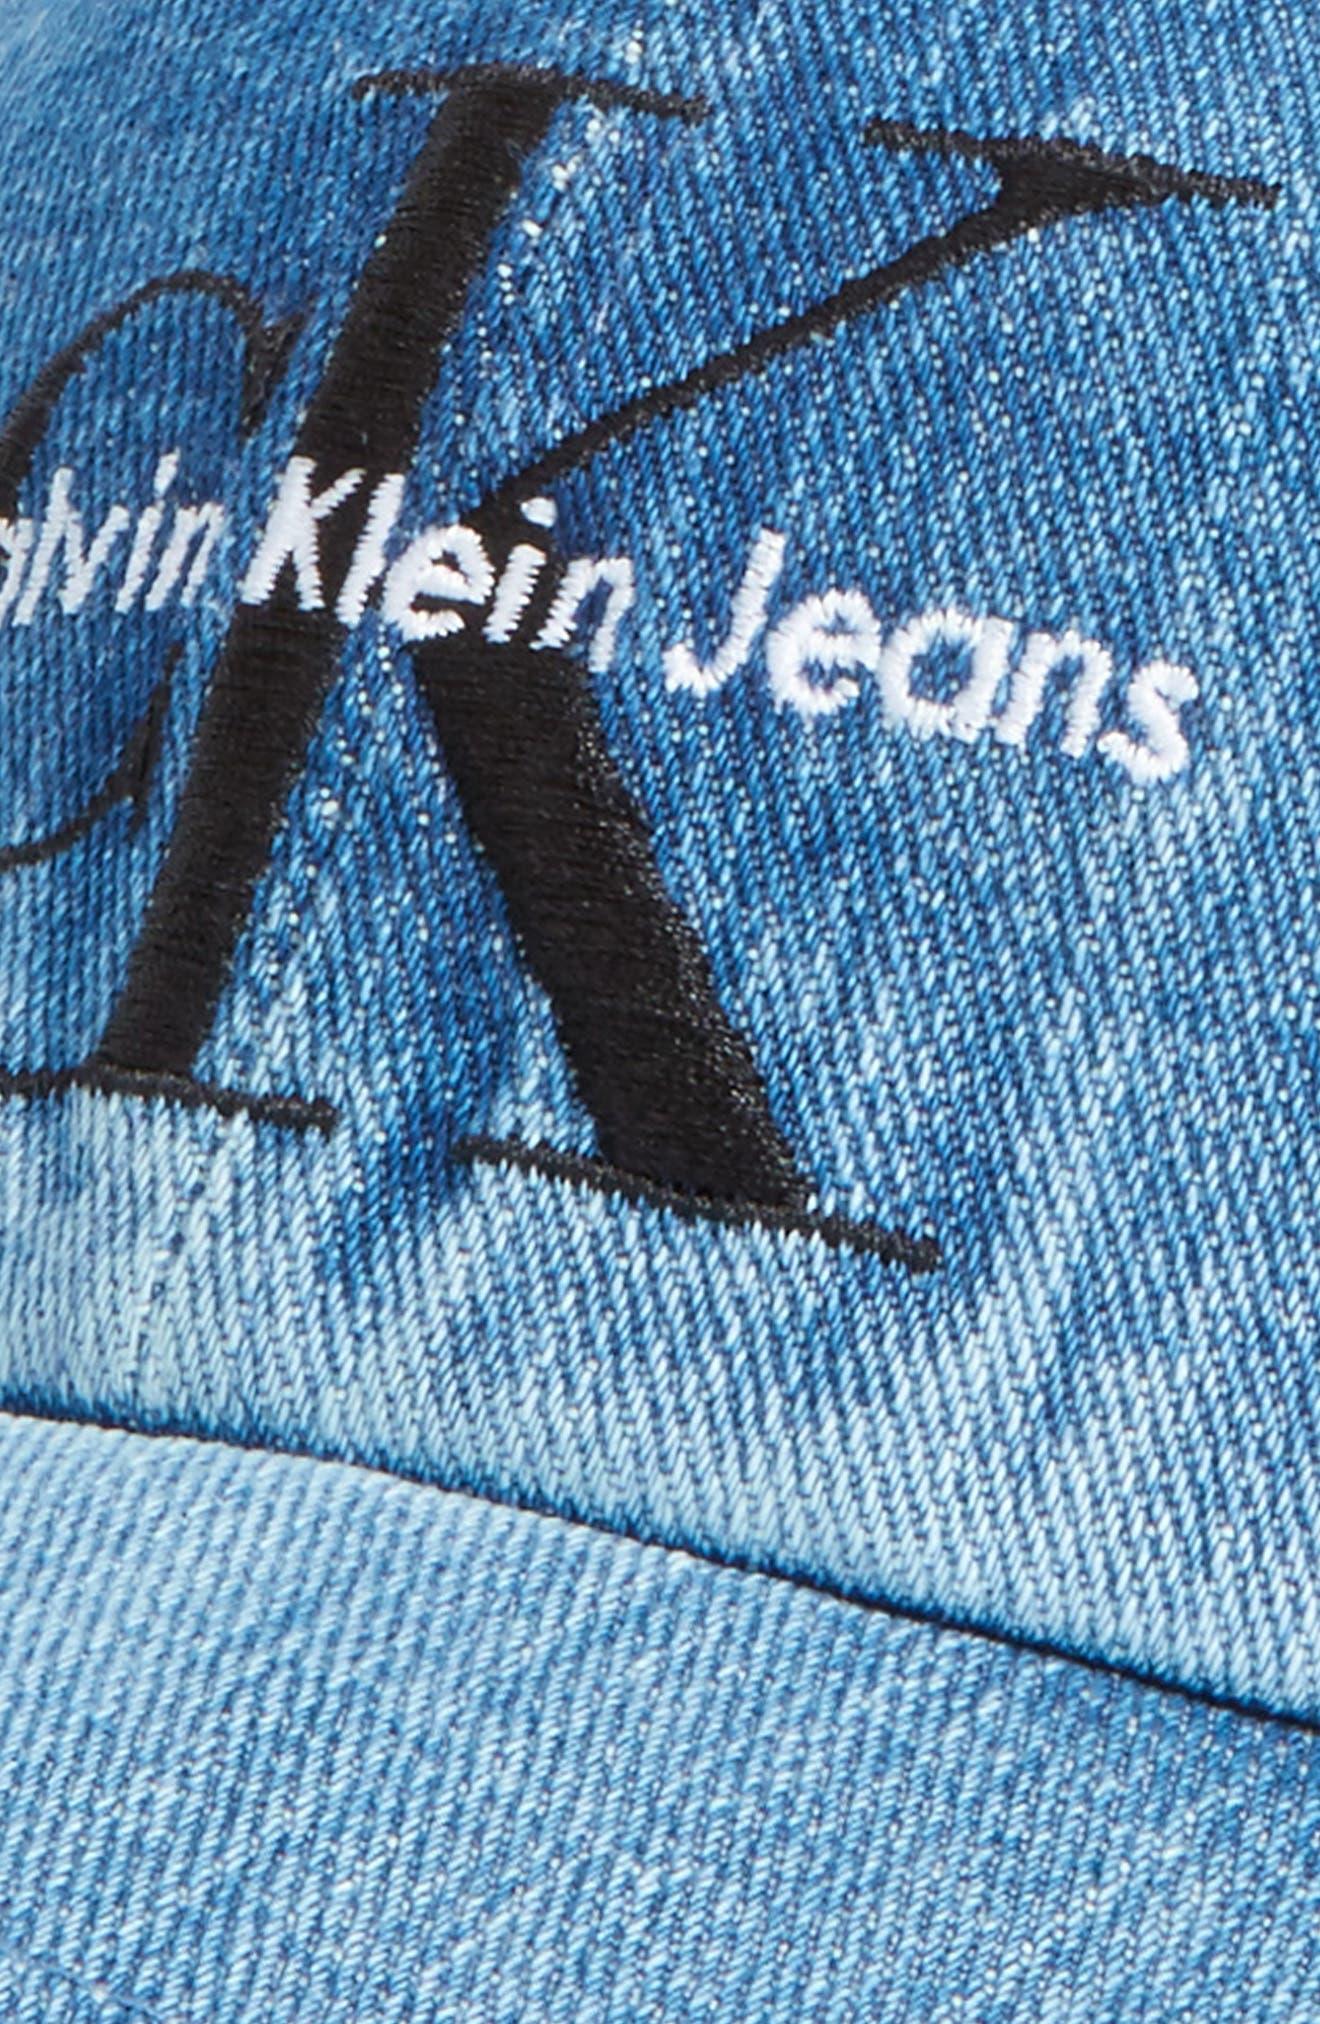 Calvin Klein CK Jeans Ball Cap,                             Alternate thumbnail 3, color,                             Stone Wash